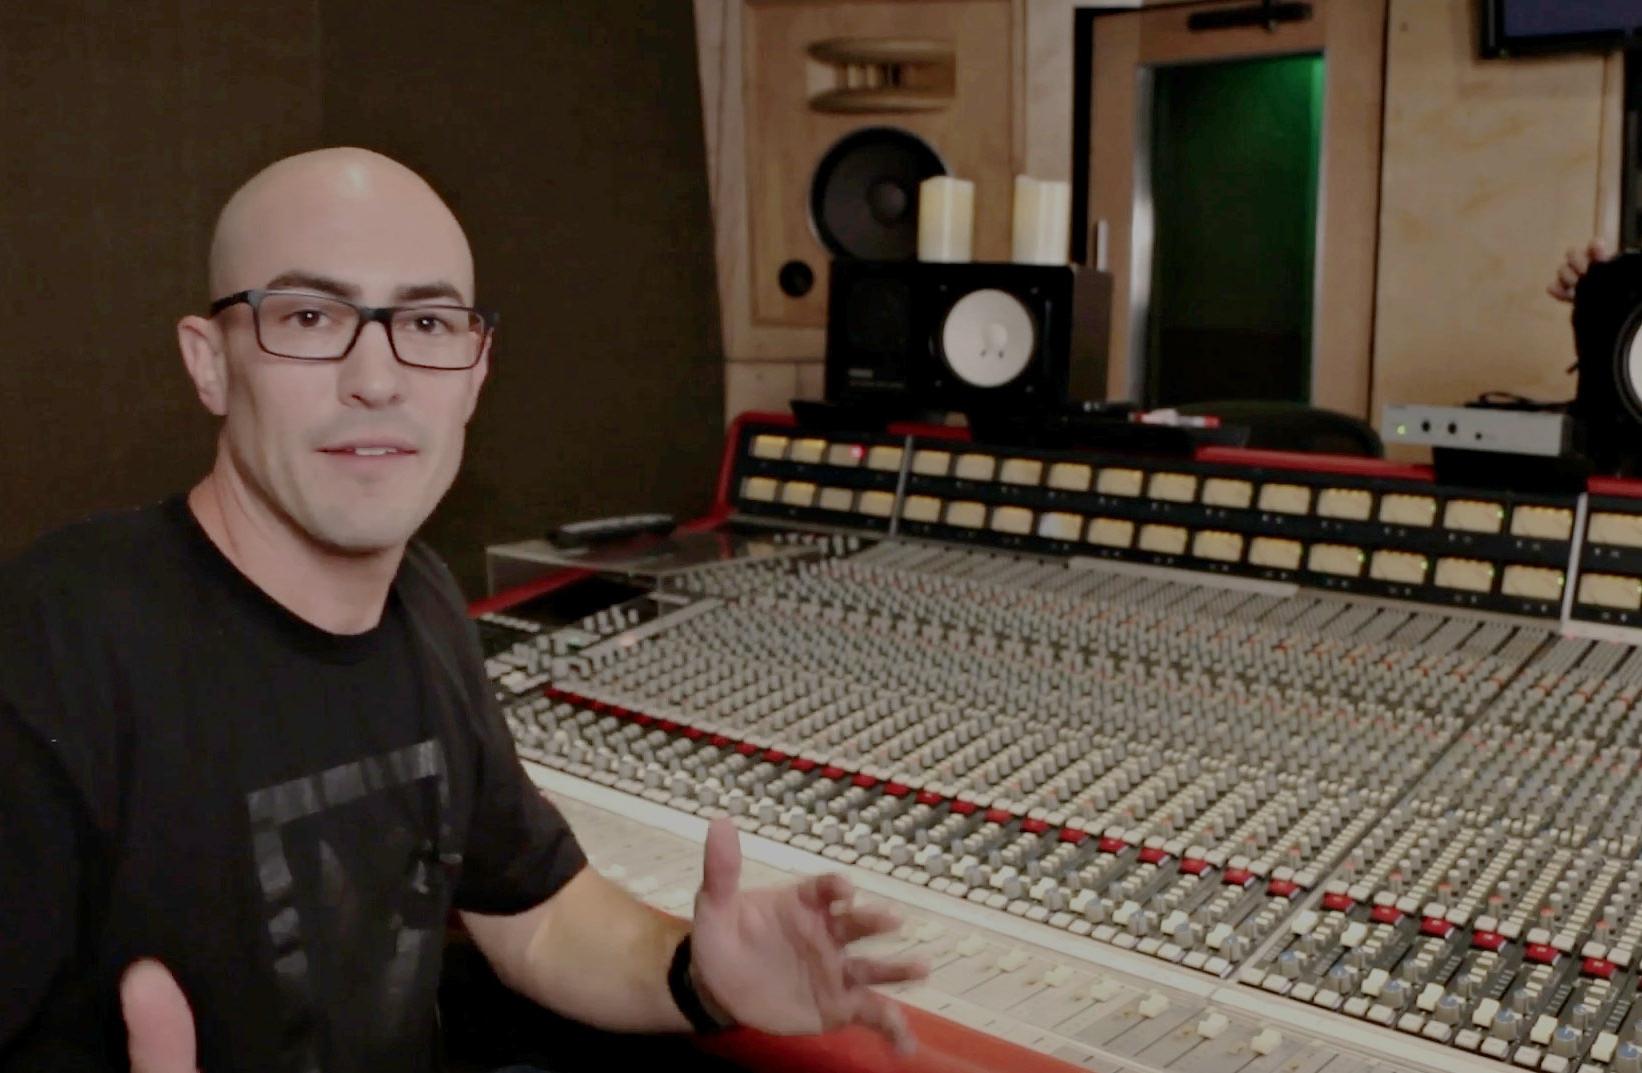 ariel-chobaz-explains mixing pop